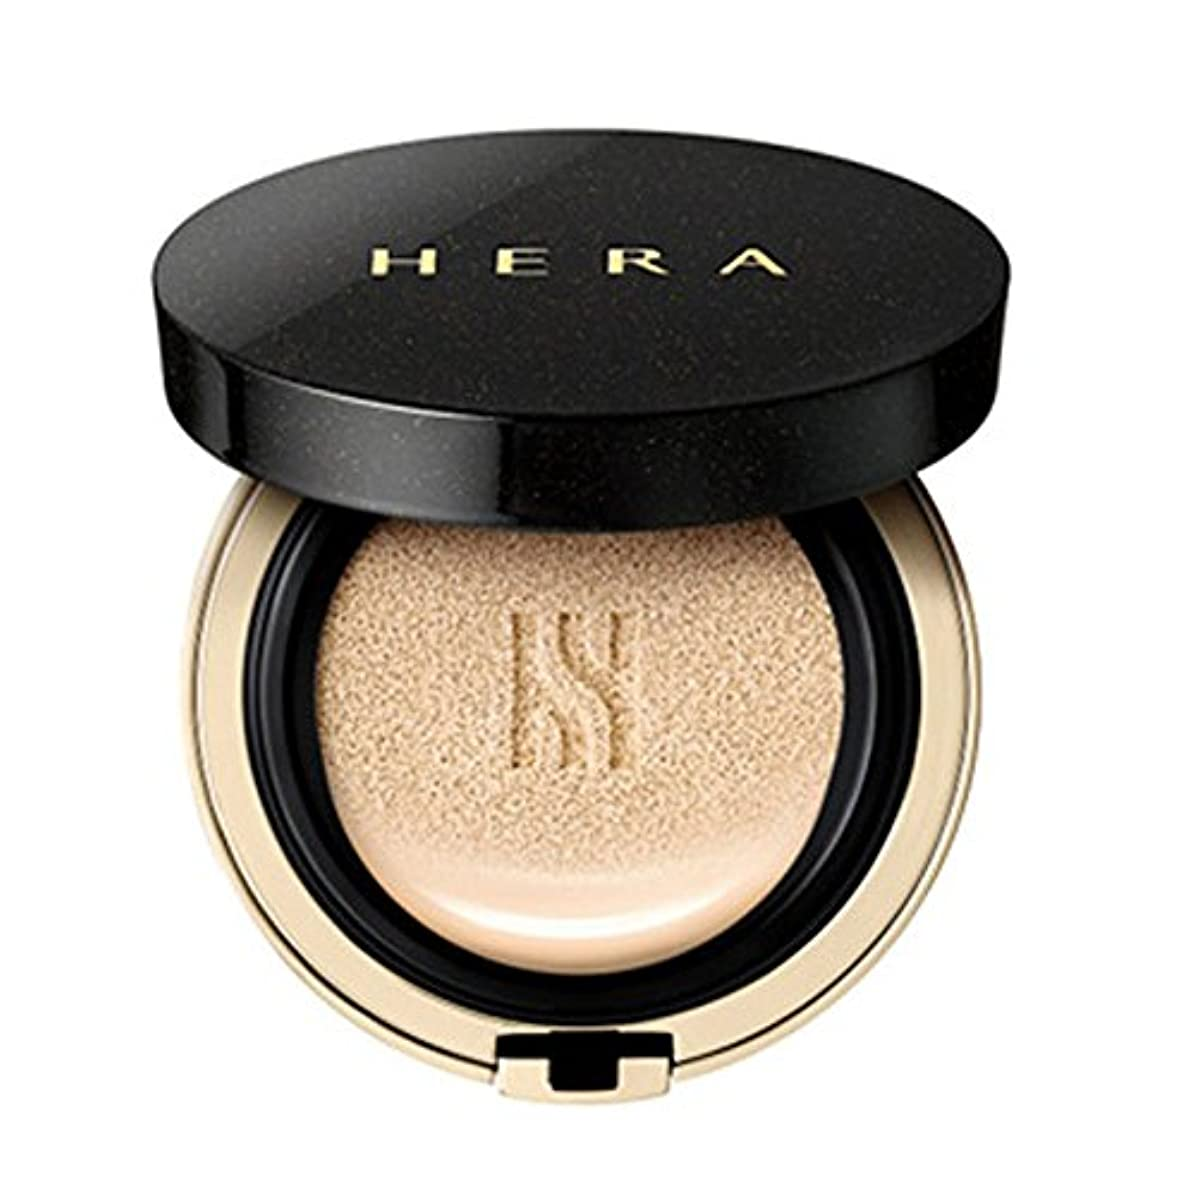 HERA(ヘラ) ブラッククッションファンデーション「13号アイボリー」 本体15ml+リフィル15ml(各1個)